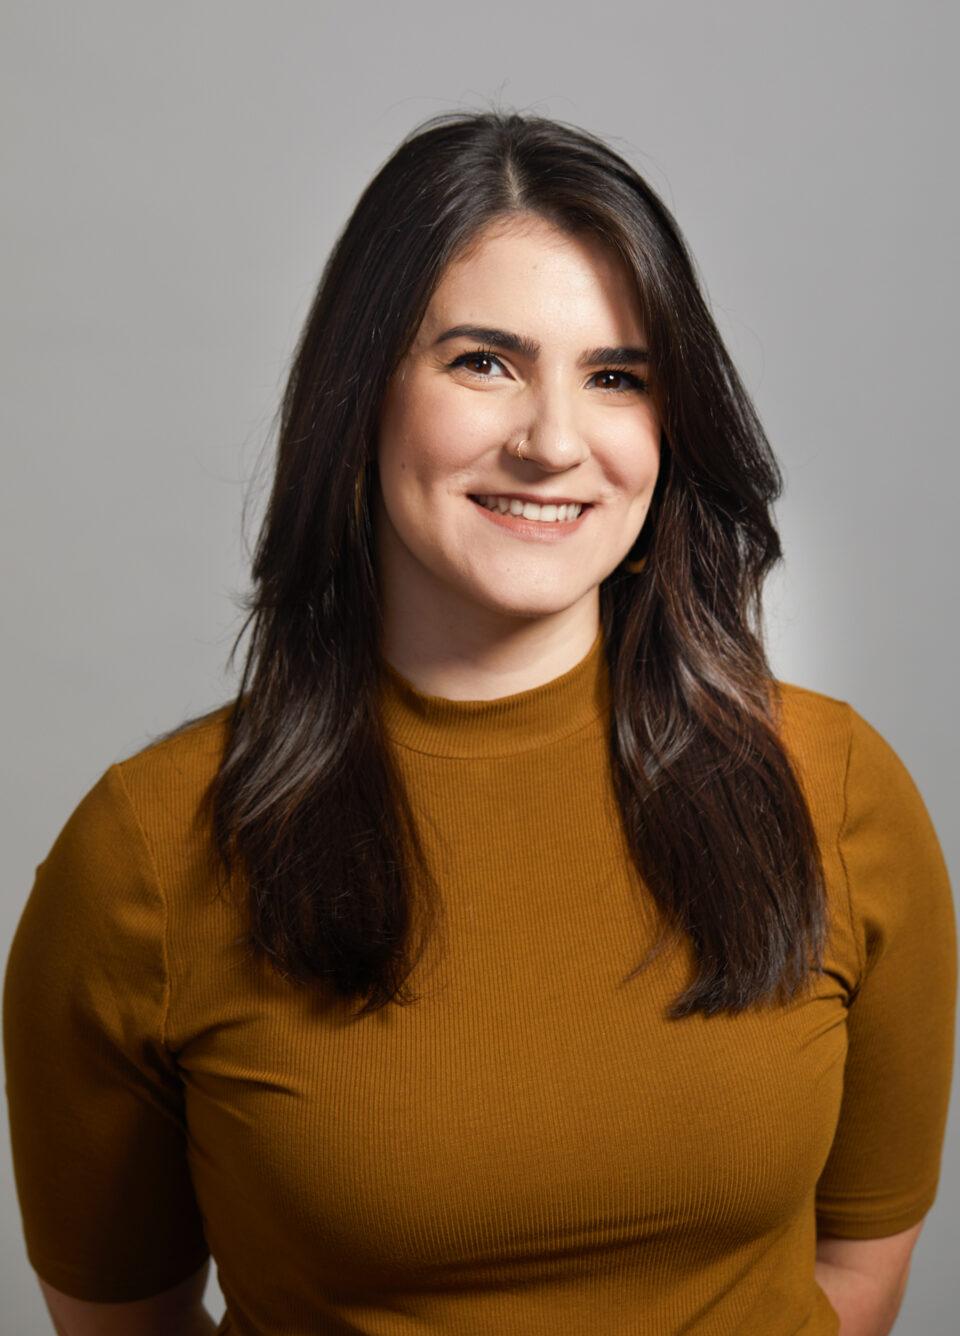 Gabriella Lanno headshot